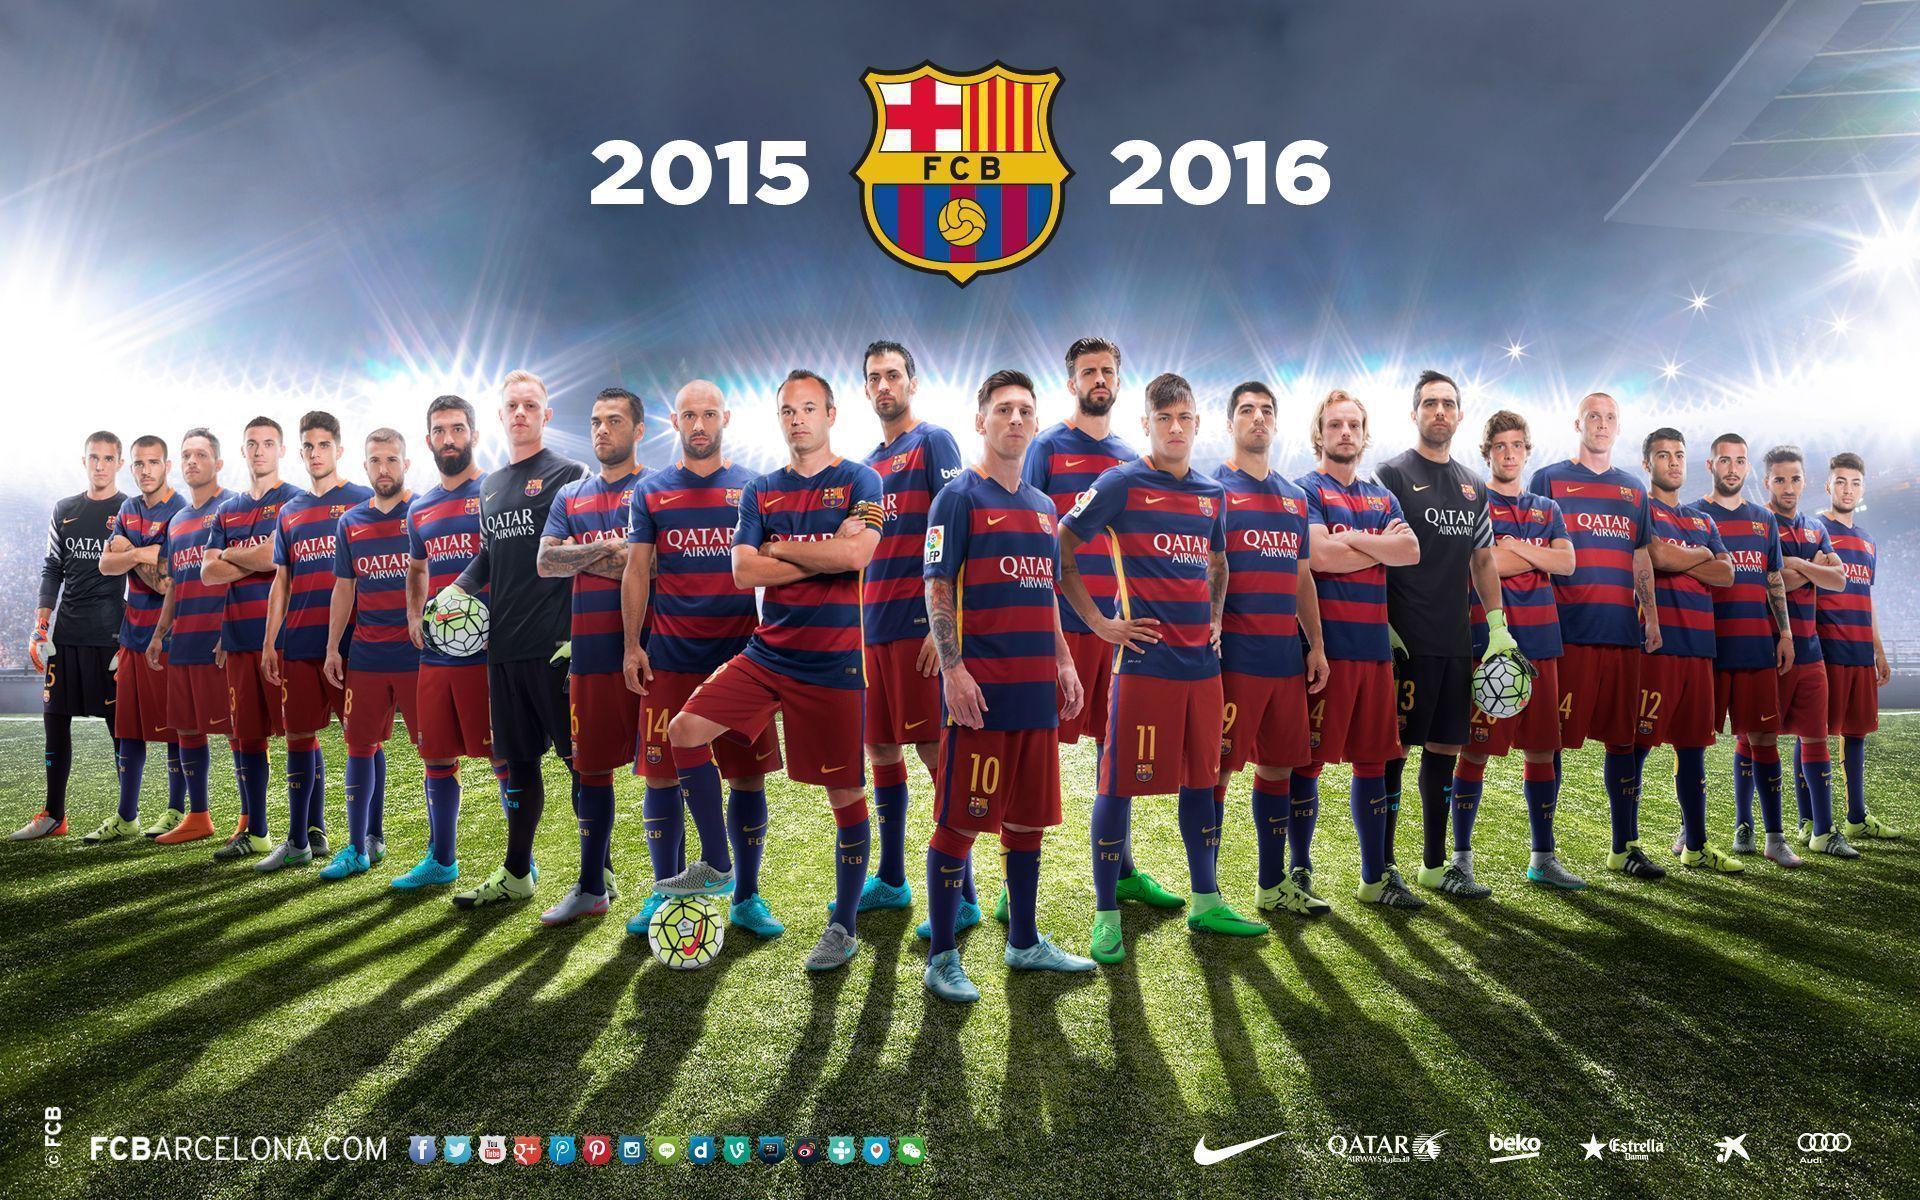 fc barcelona wallpapers 2016 wallpaper cave fc barcelona wallpapers 2016